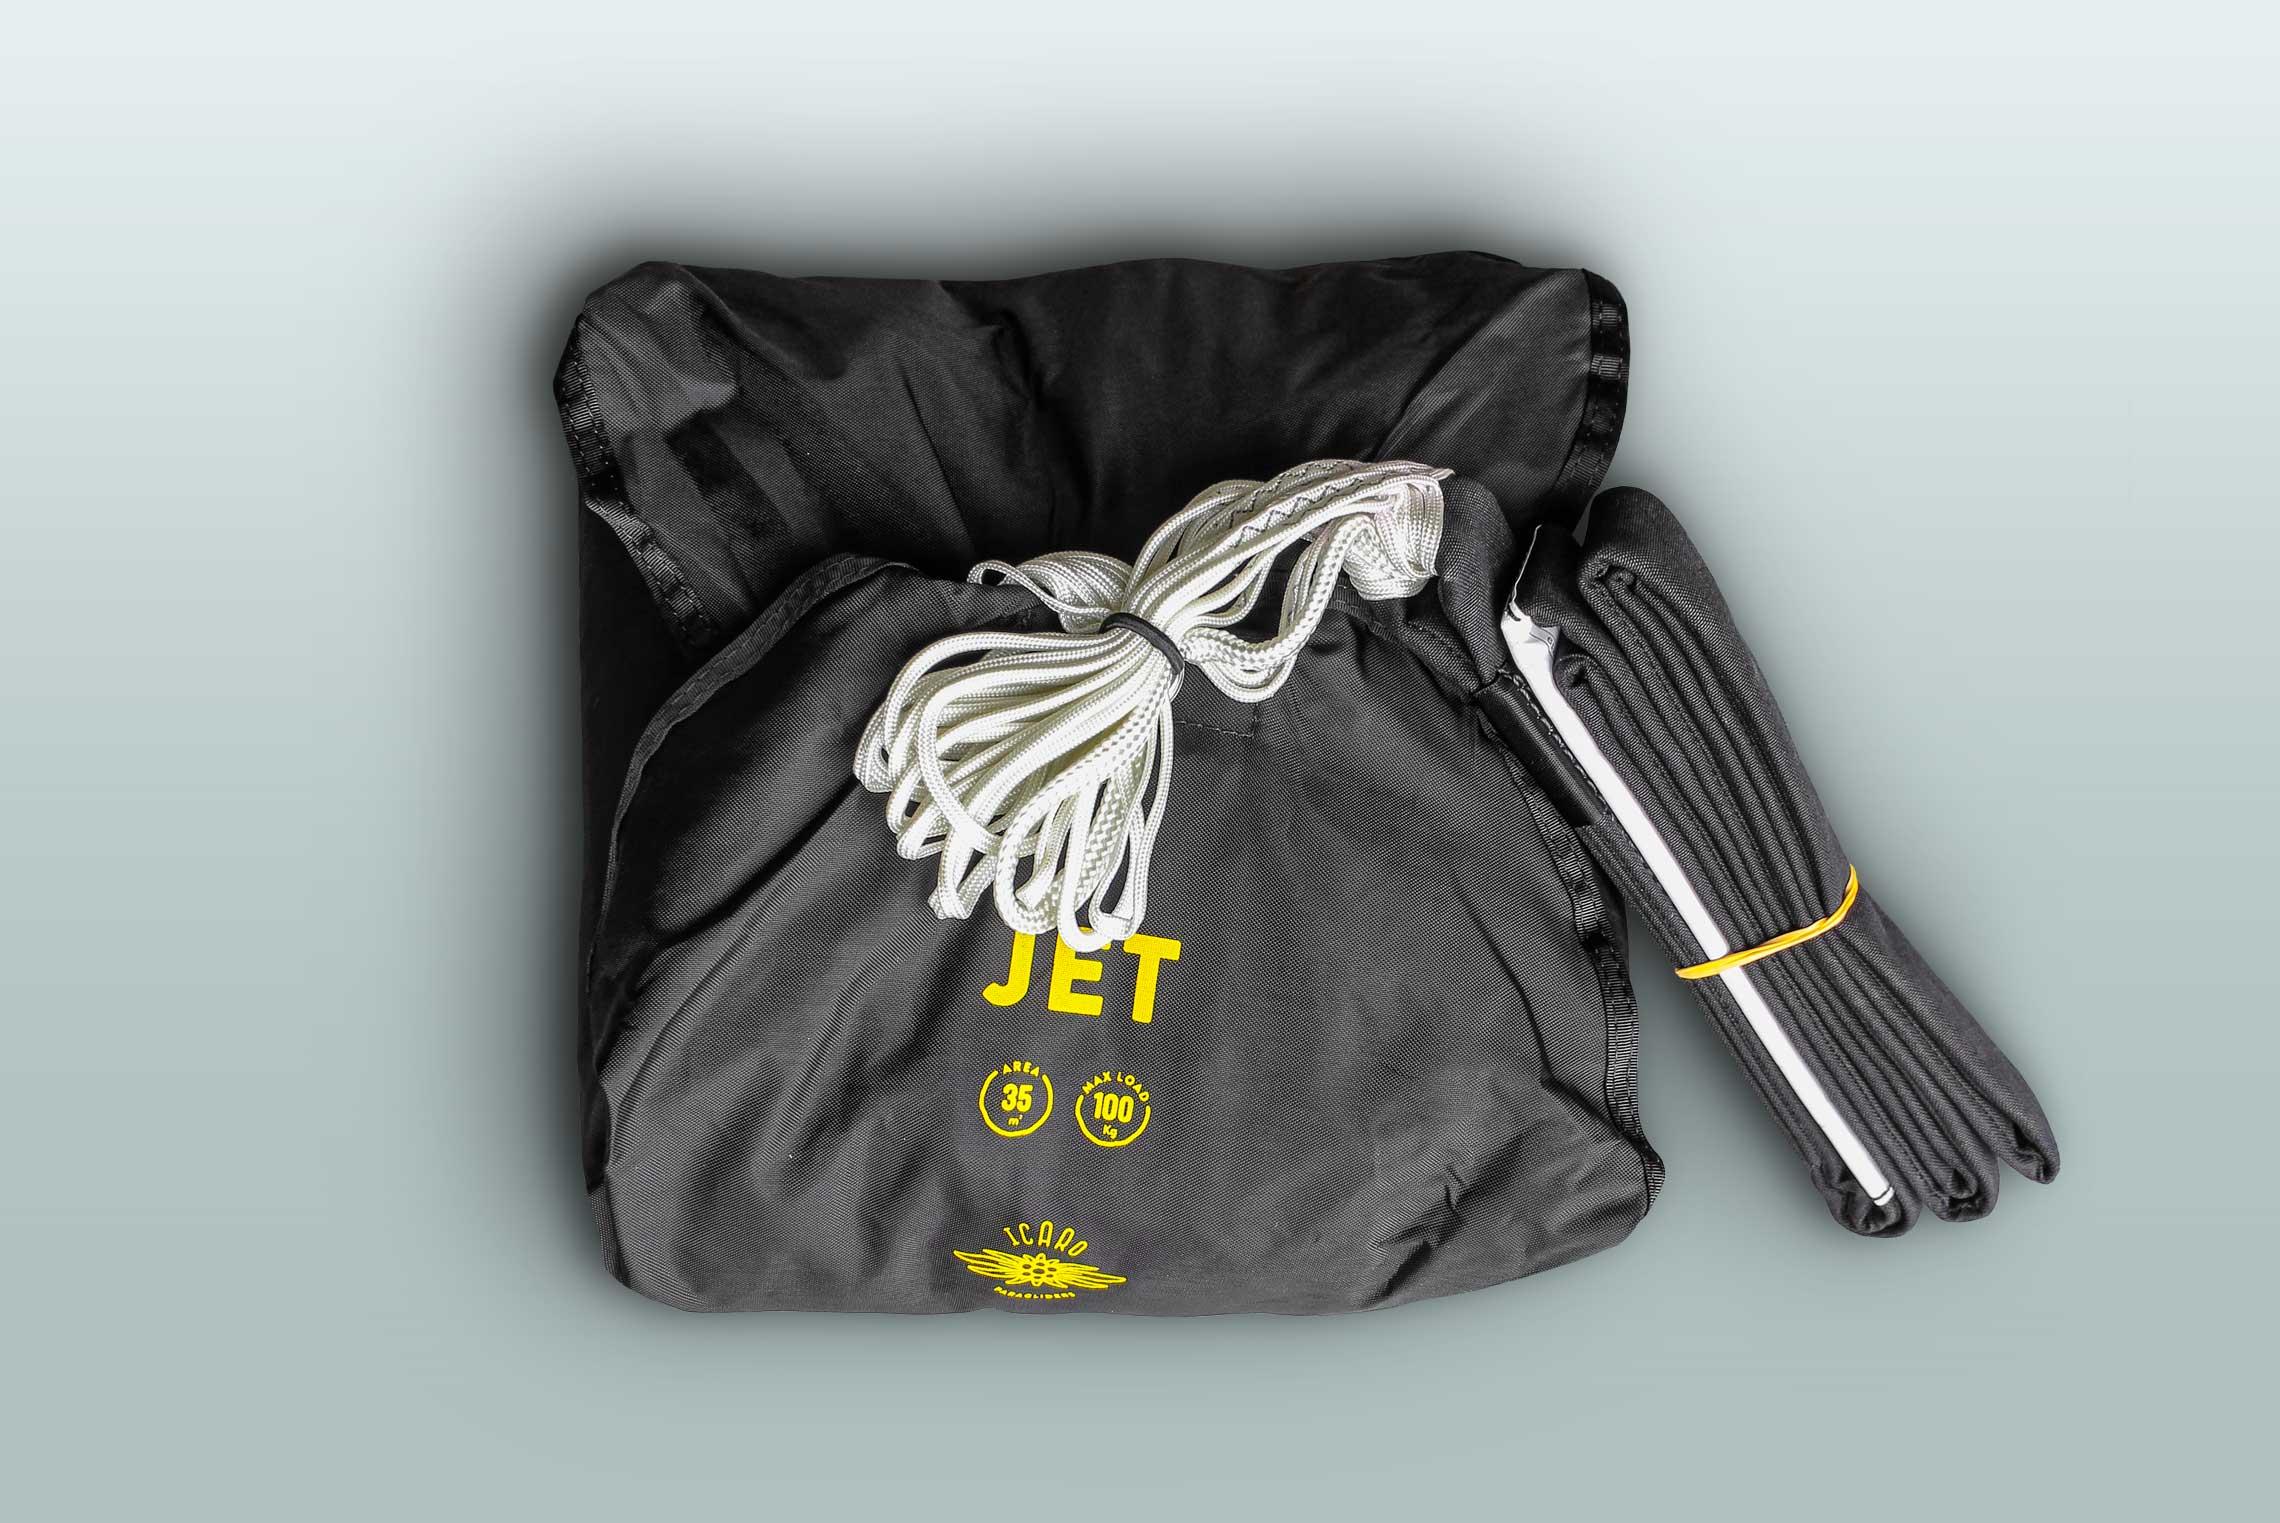 Icaro-Paragliders-Nödskärm-Jet-Gallery_01